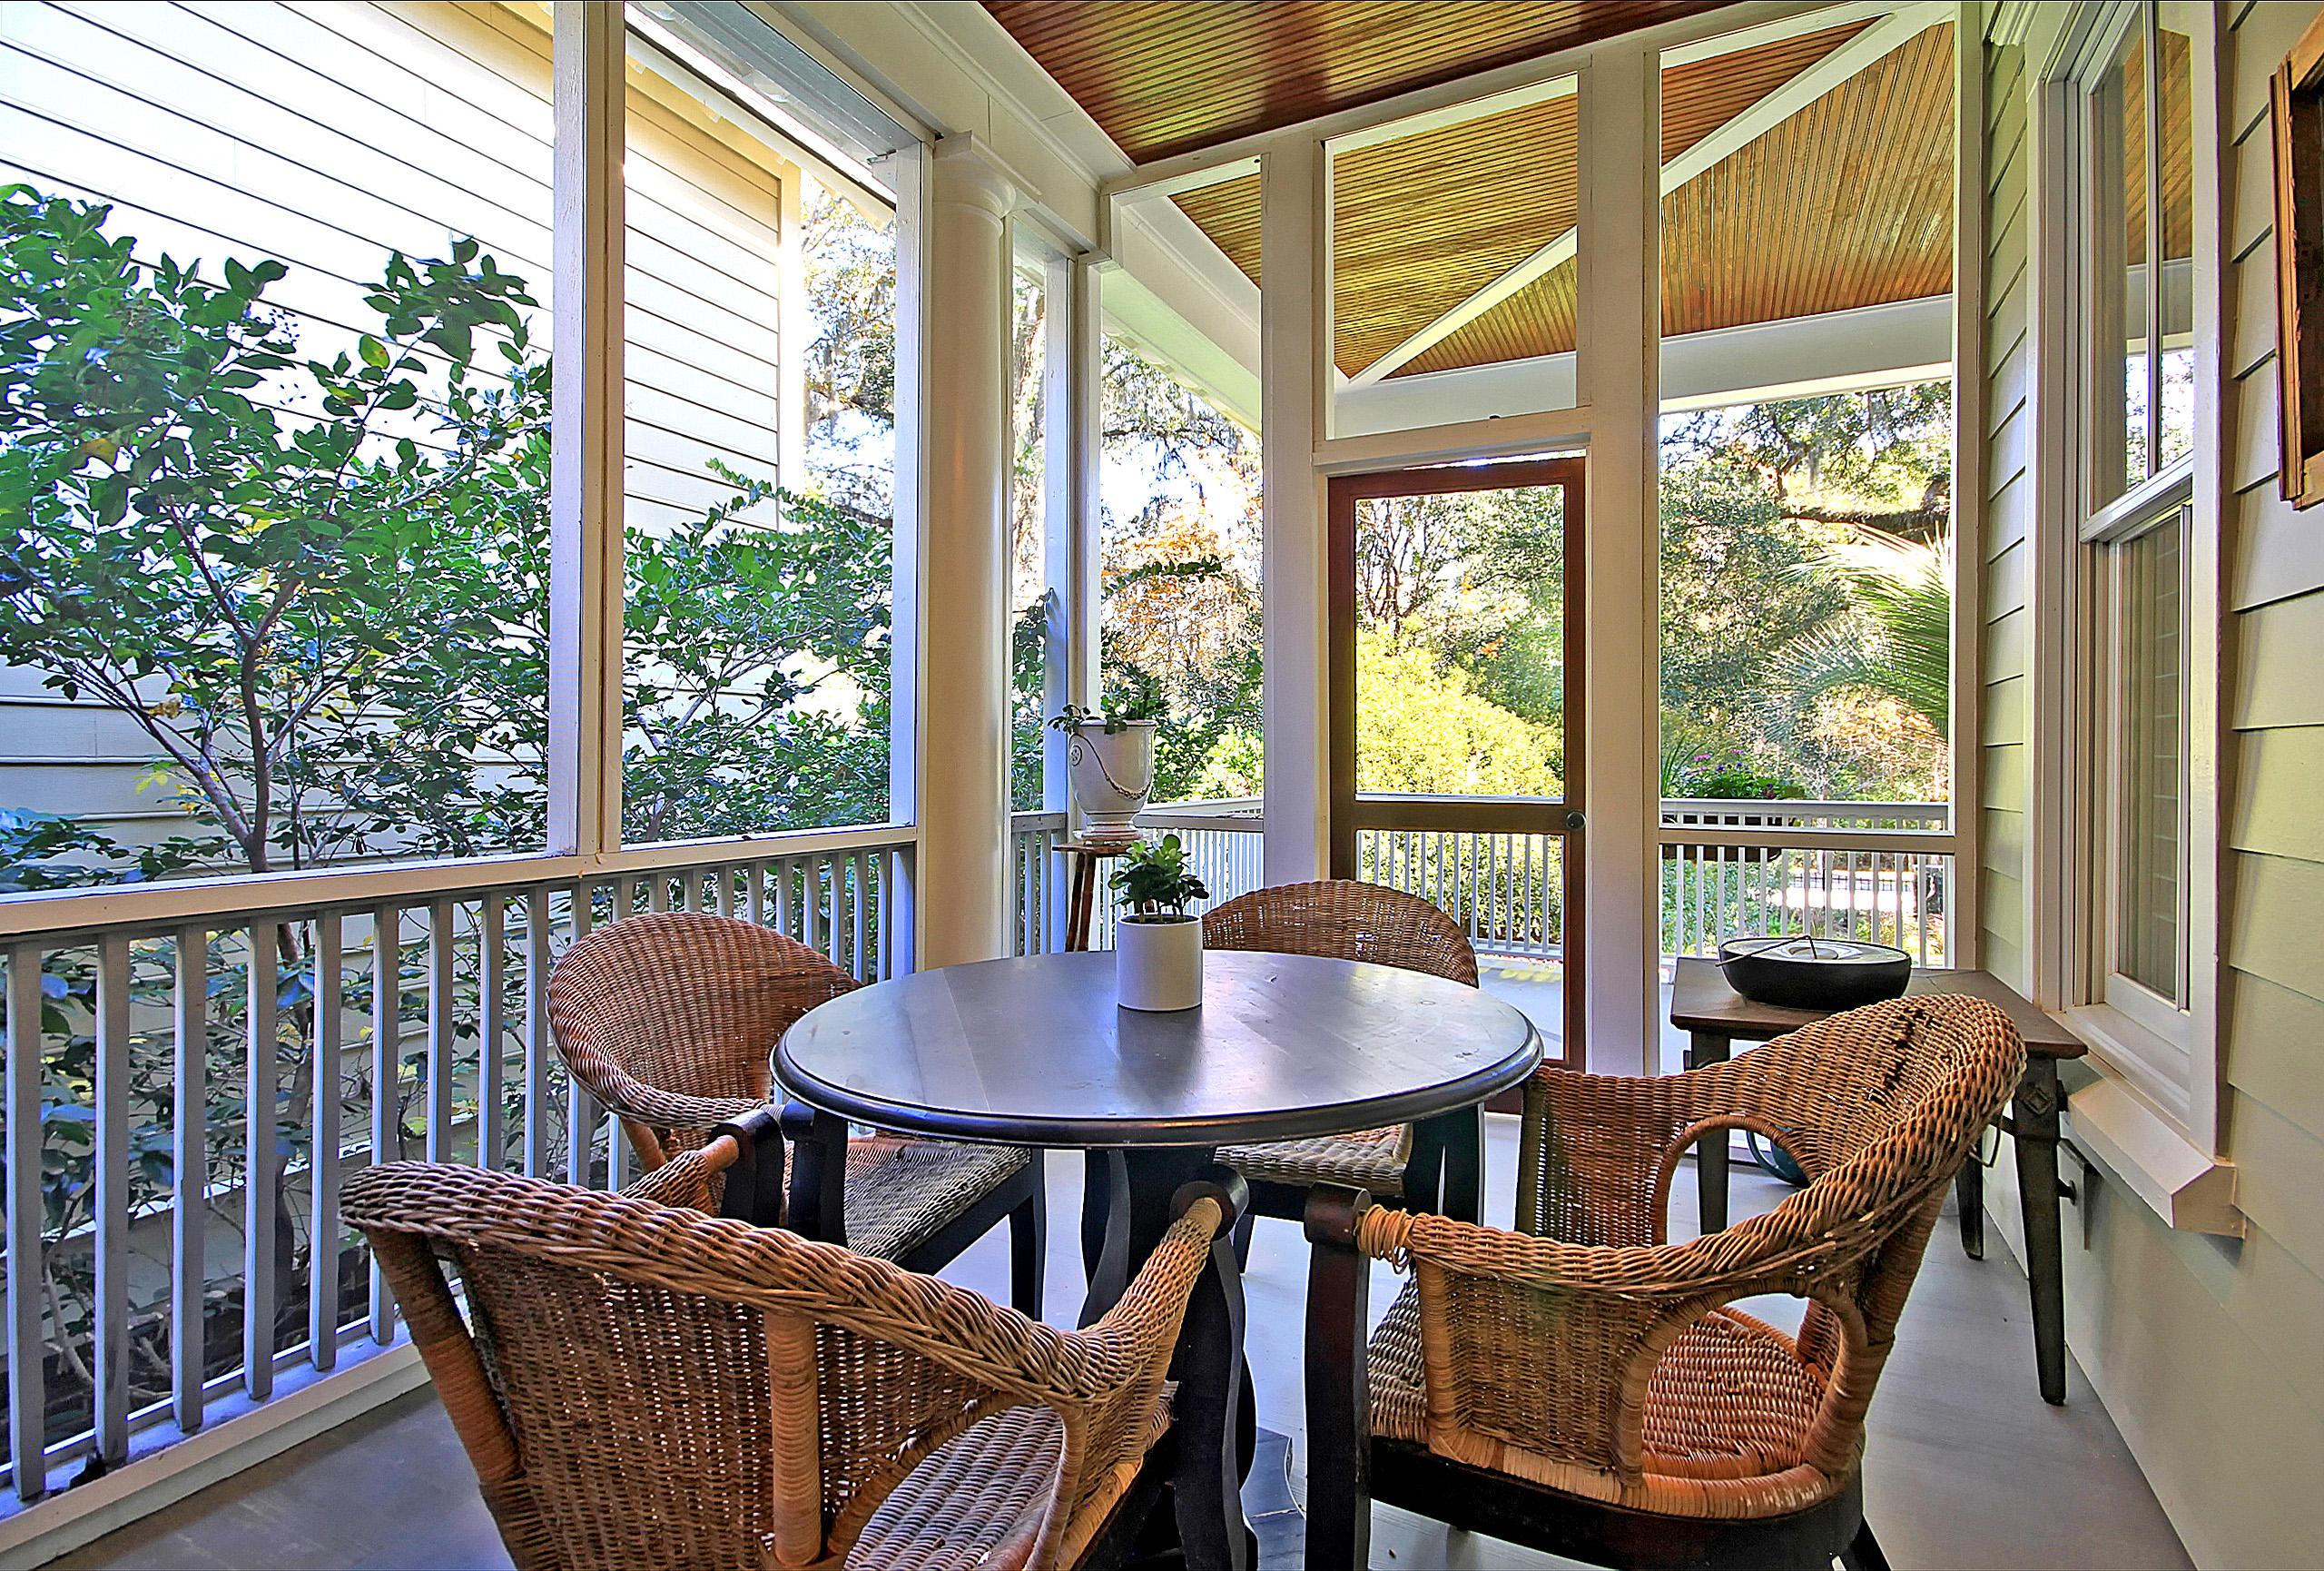 Daniel Island Park Homes For Sale - 231 Delahow, Daniel Island, SC - 10